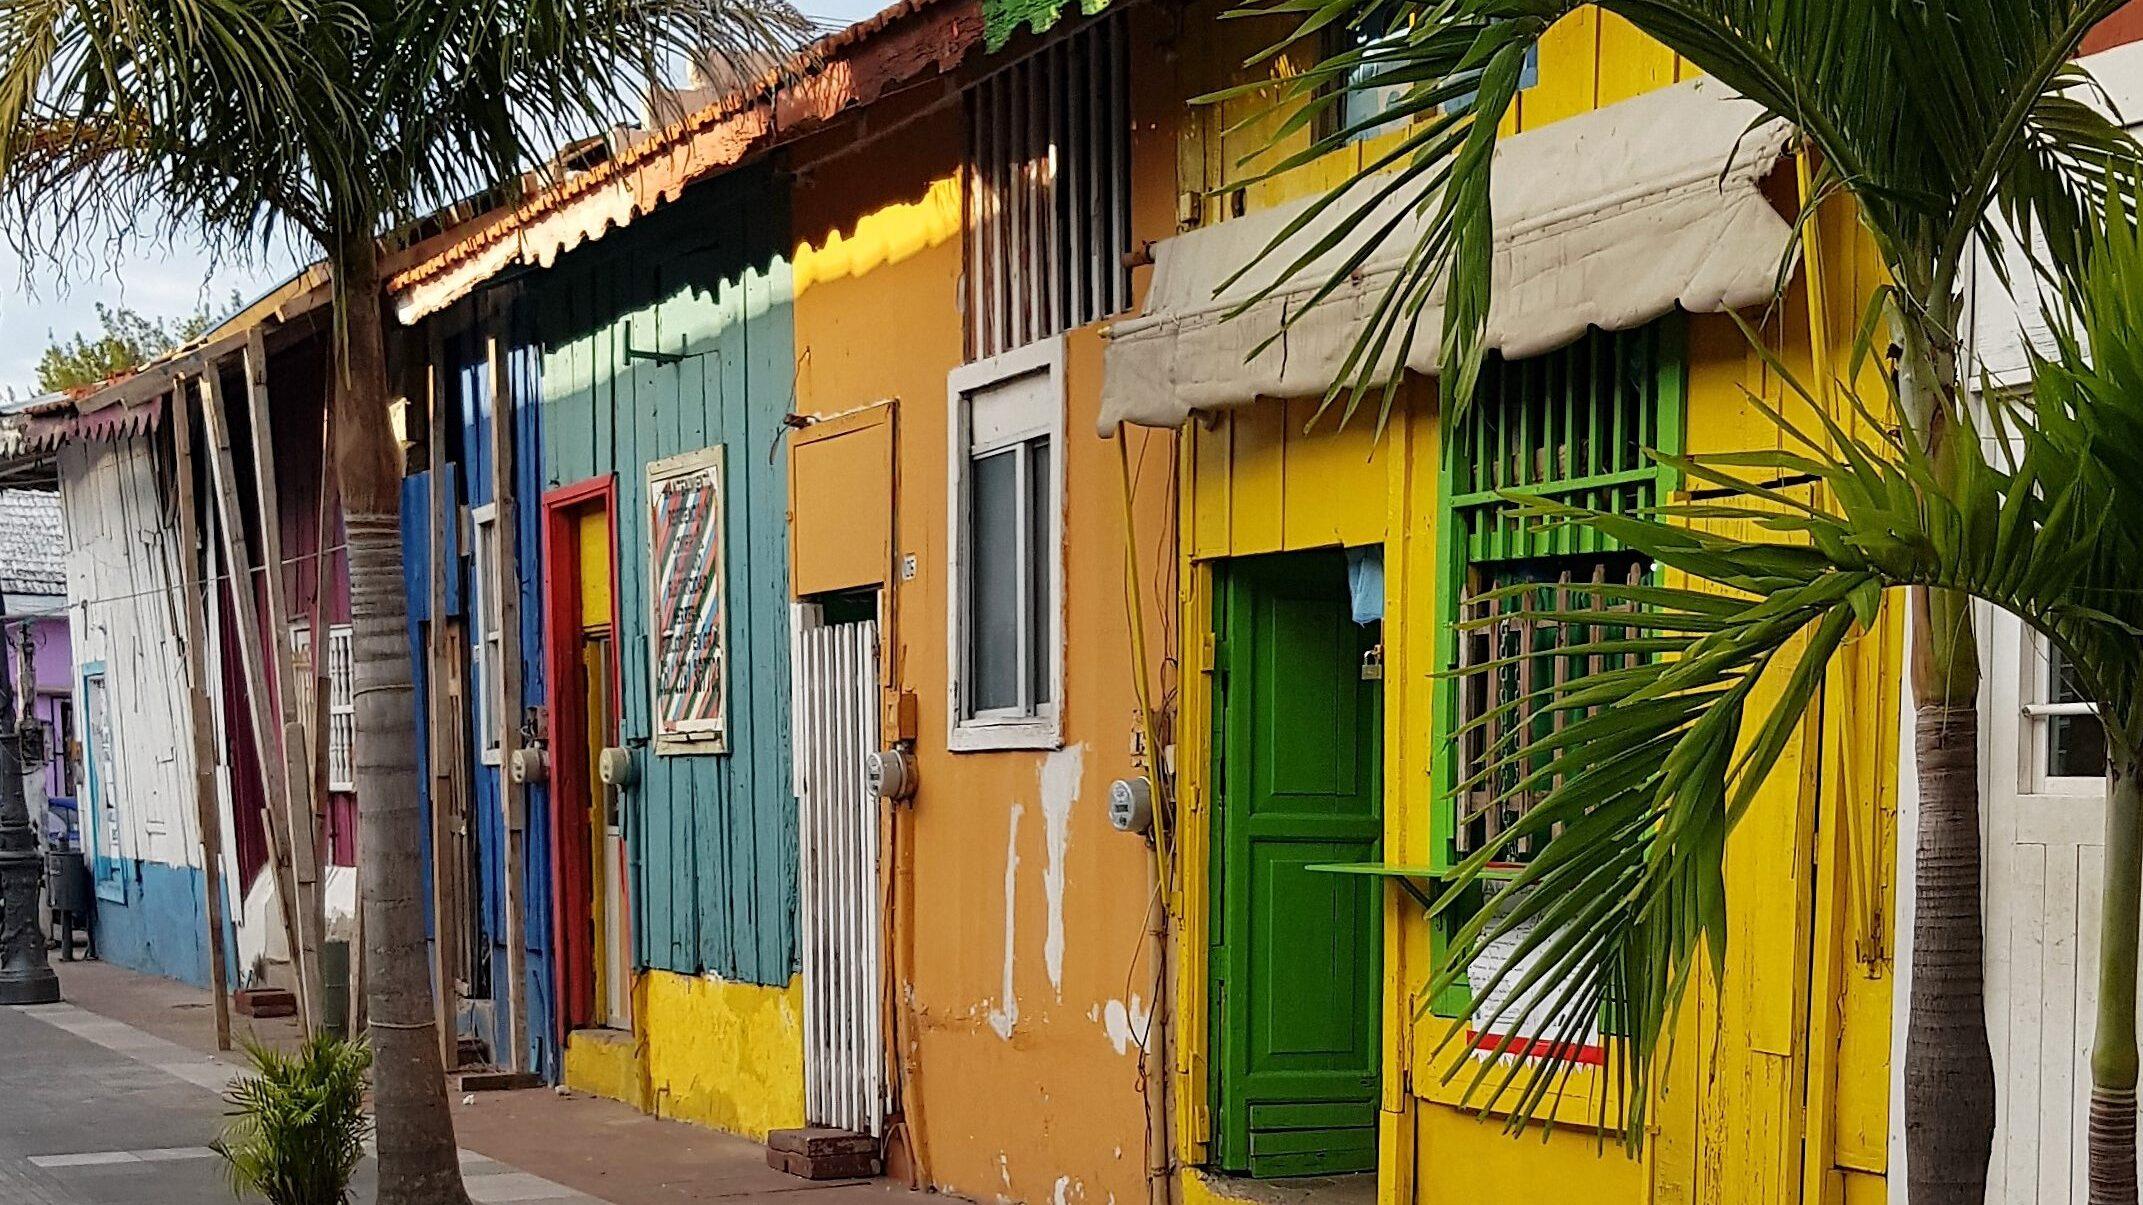 Huaca: The Most Colorful Neighborhood In Veracruz